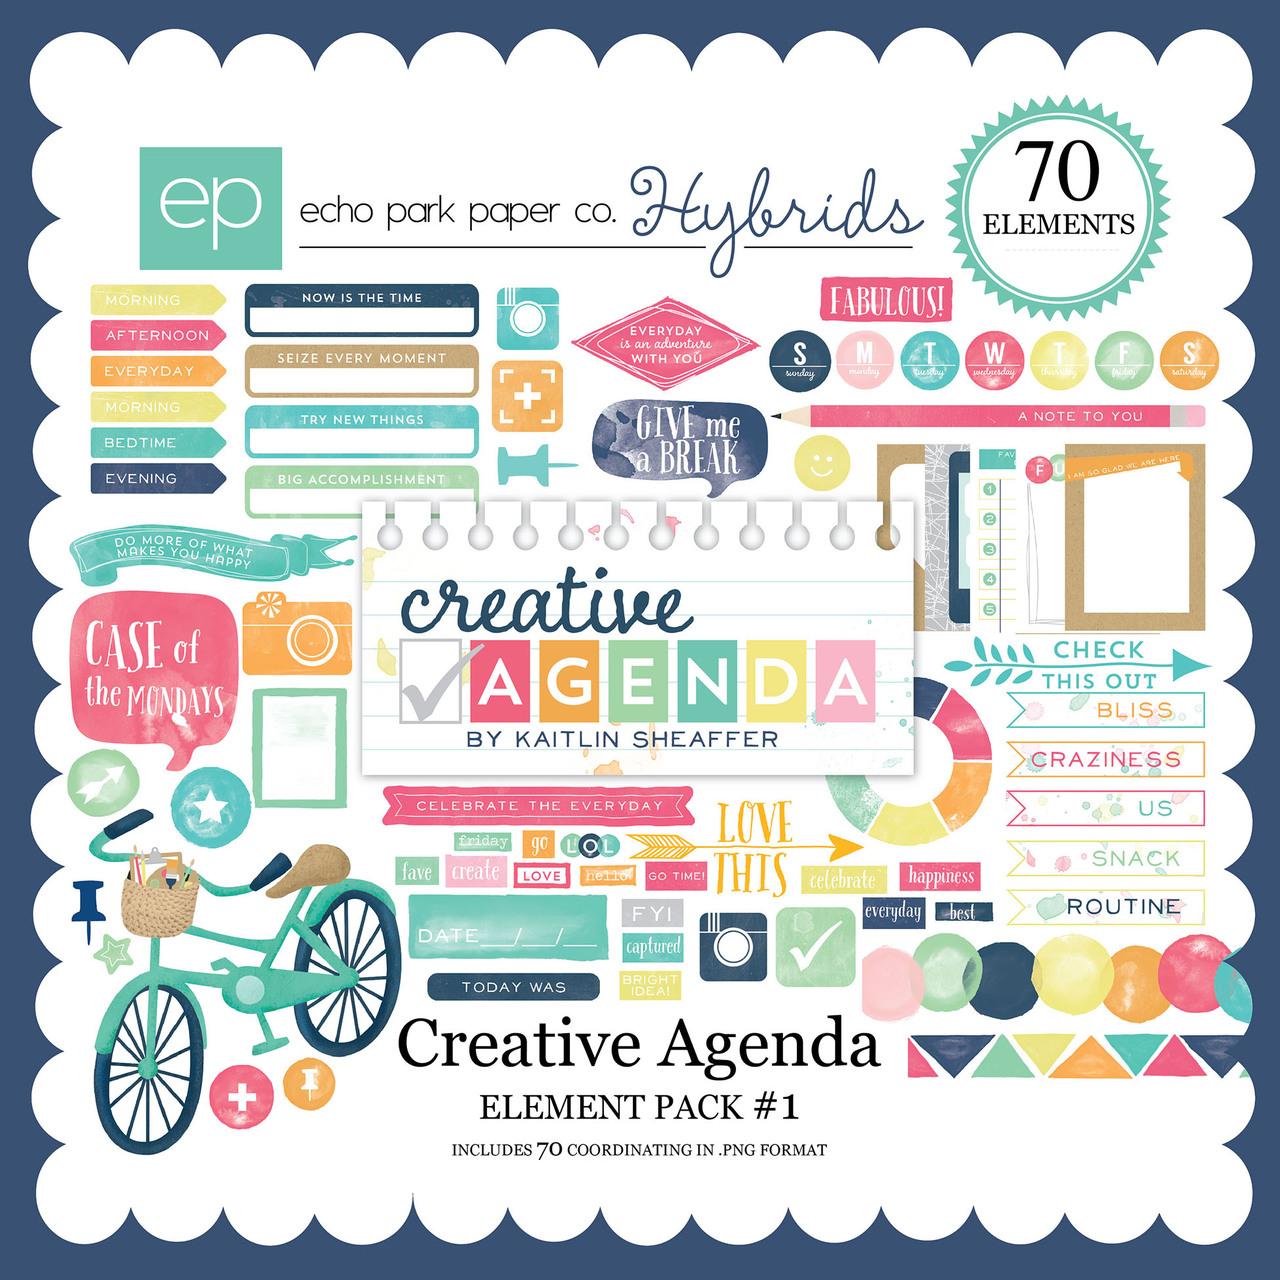 Creative Agenda Element Pack #1